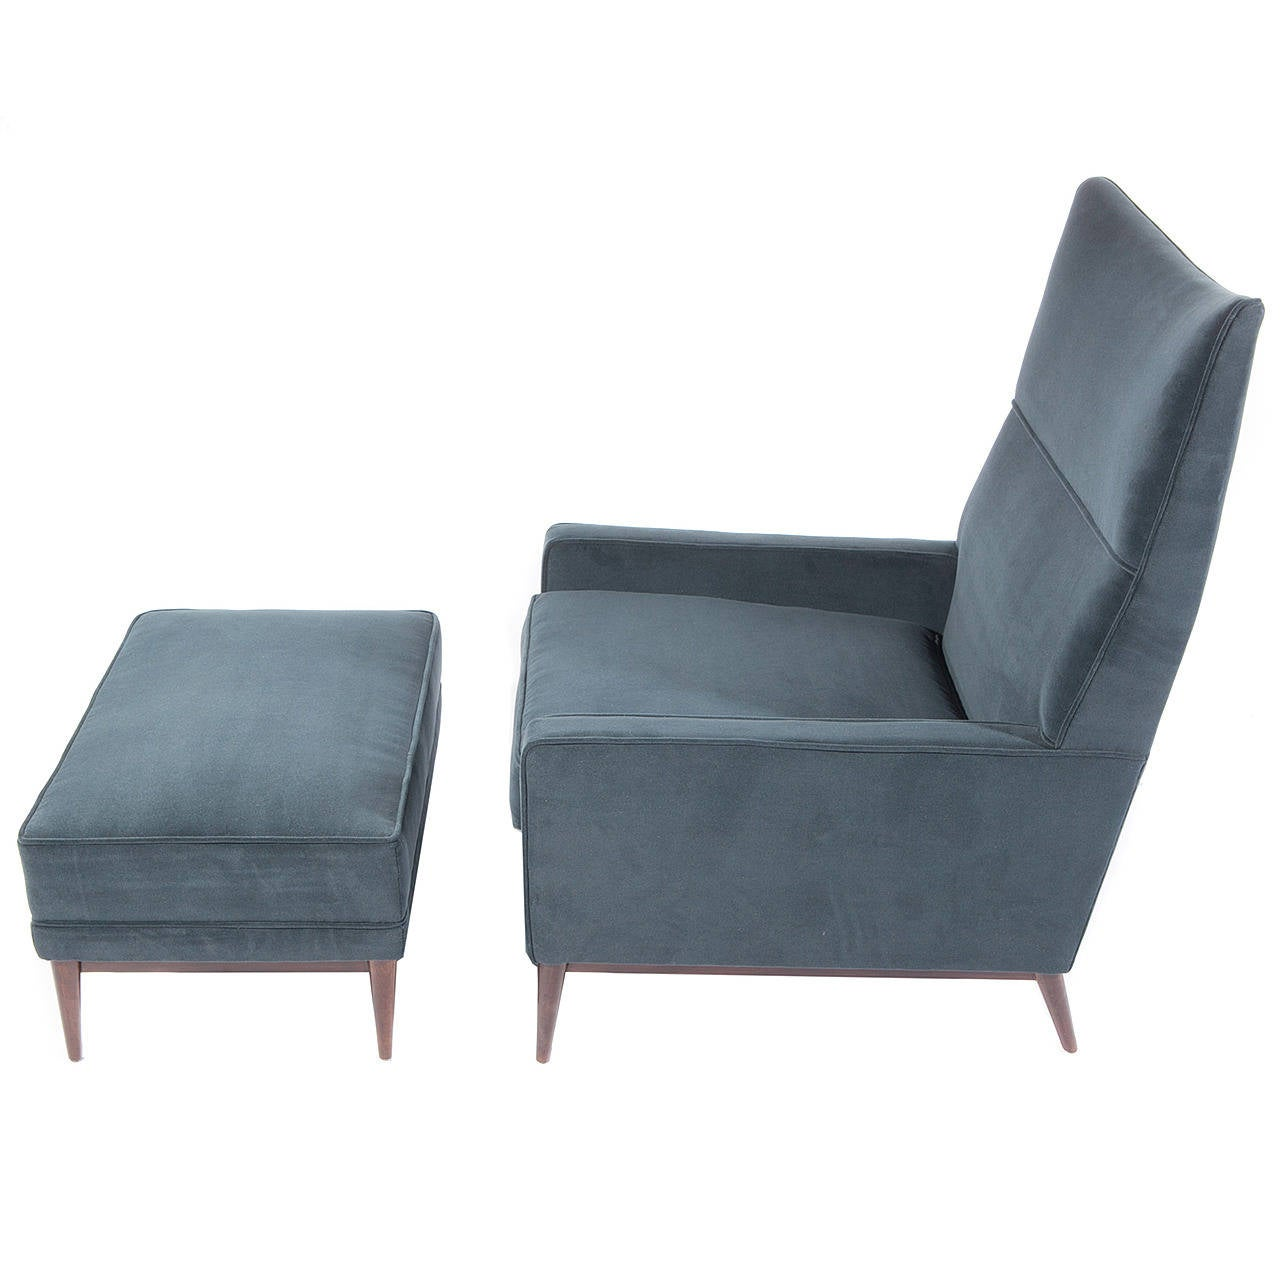 Paul McCobb High Back Lounge Chair and Ottoman at 1stdibs